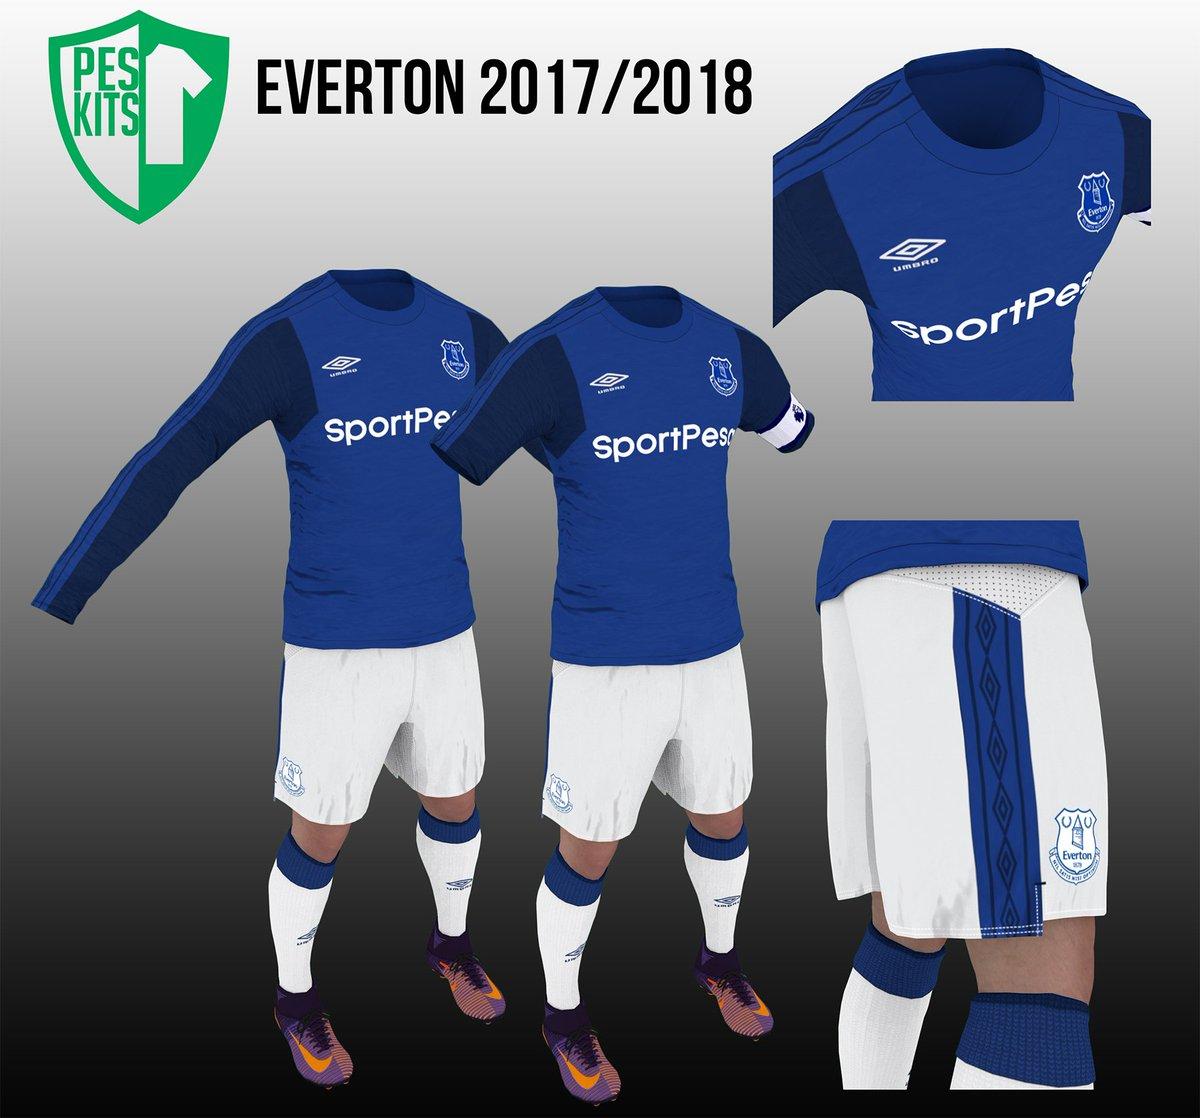 Indra Dian Kurniadi Di Twitter Everton 2017 18 Home Kit Peskits Pes2017